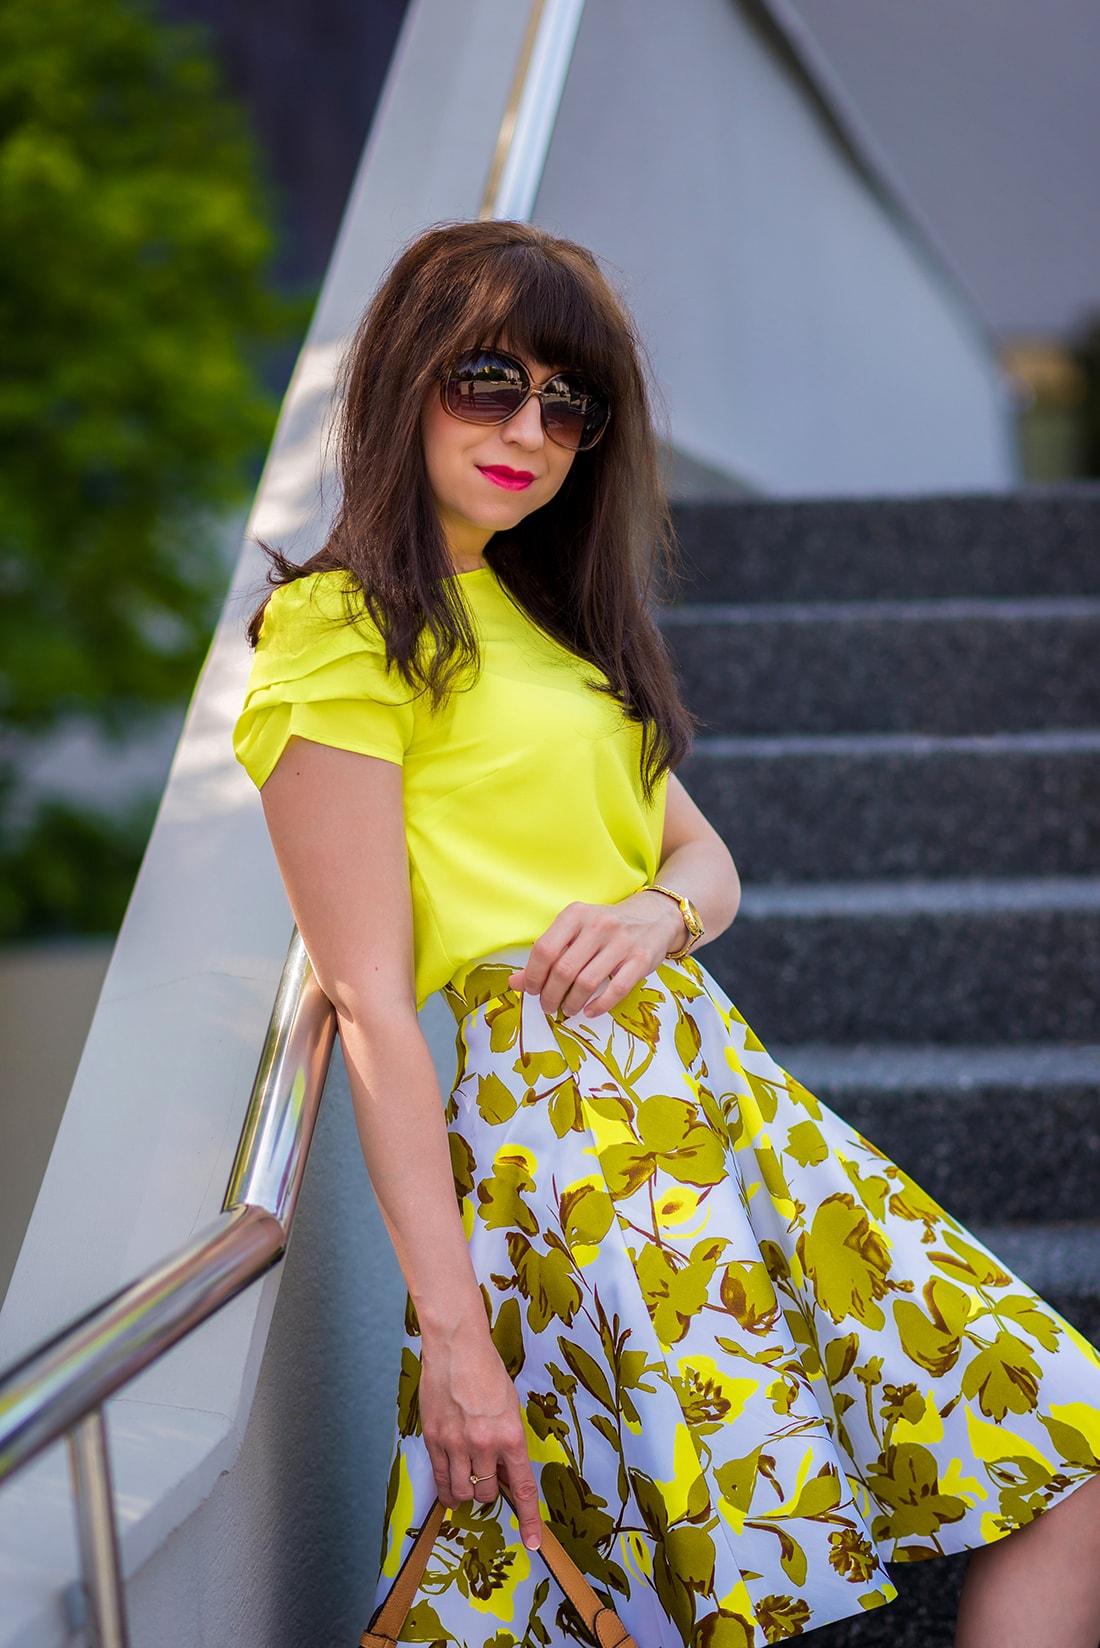 SUKŃA NA LETO OD MARGIFASHION_Katharine-fashion is beautiful_blog 2_Sukňa zelené kvety_Zlaté šľapky Sagan_Katarína Jakubčová_Fashion blogger